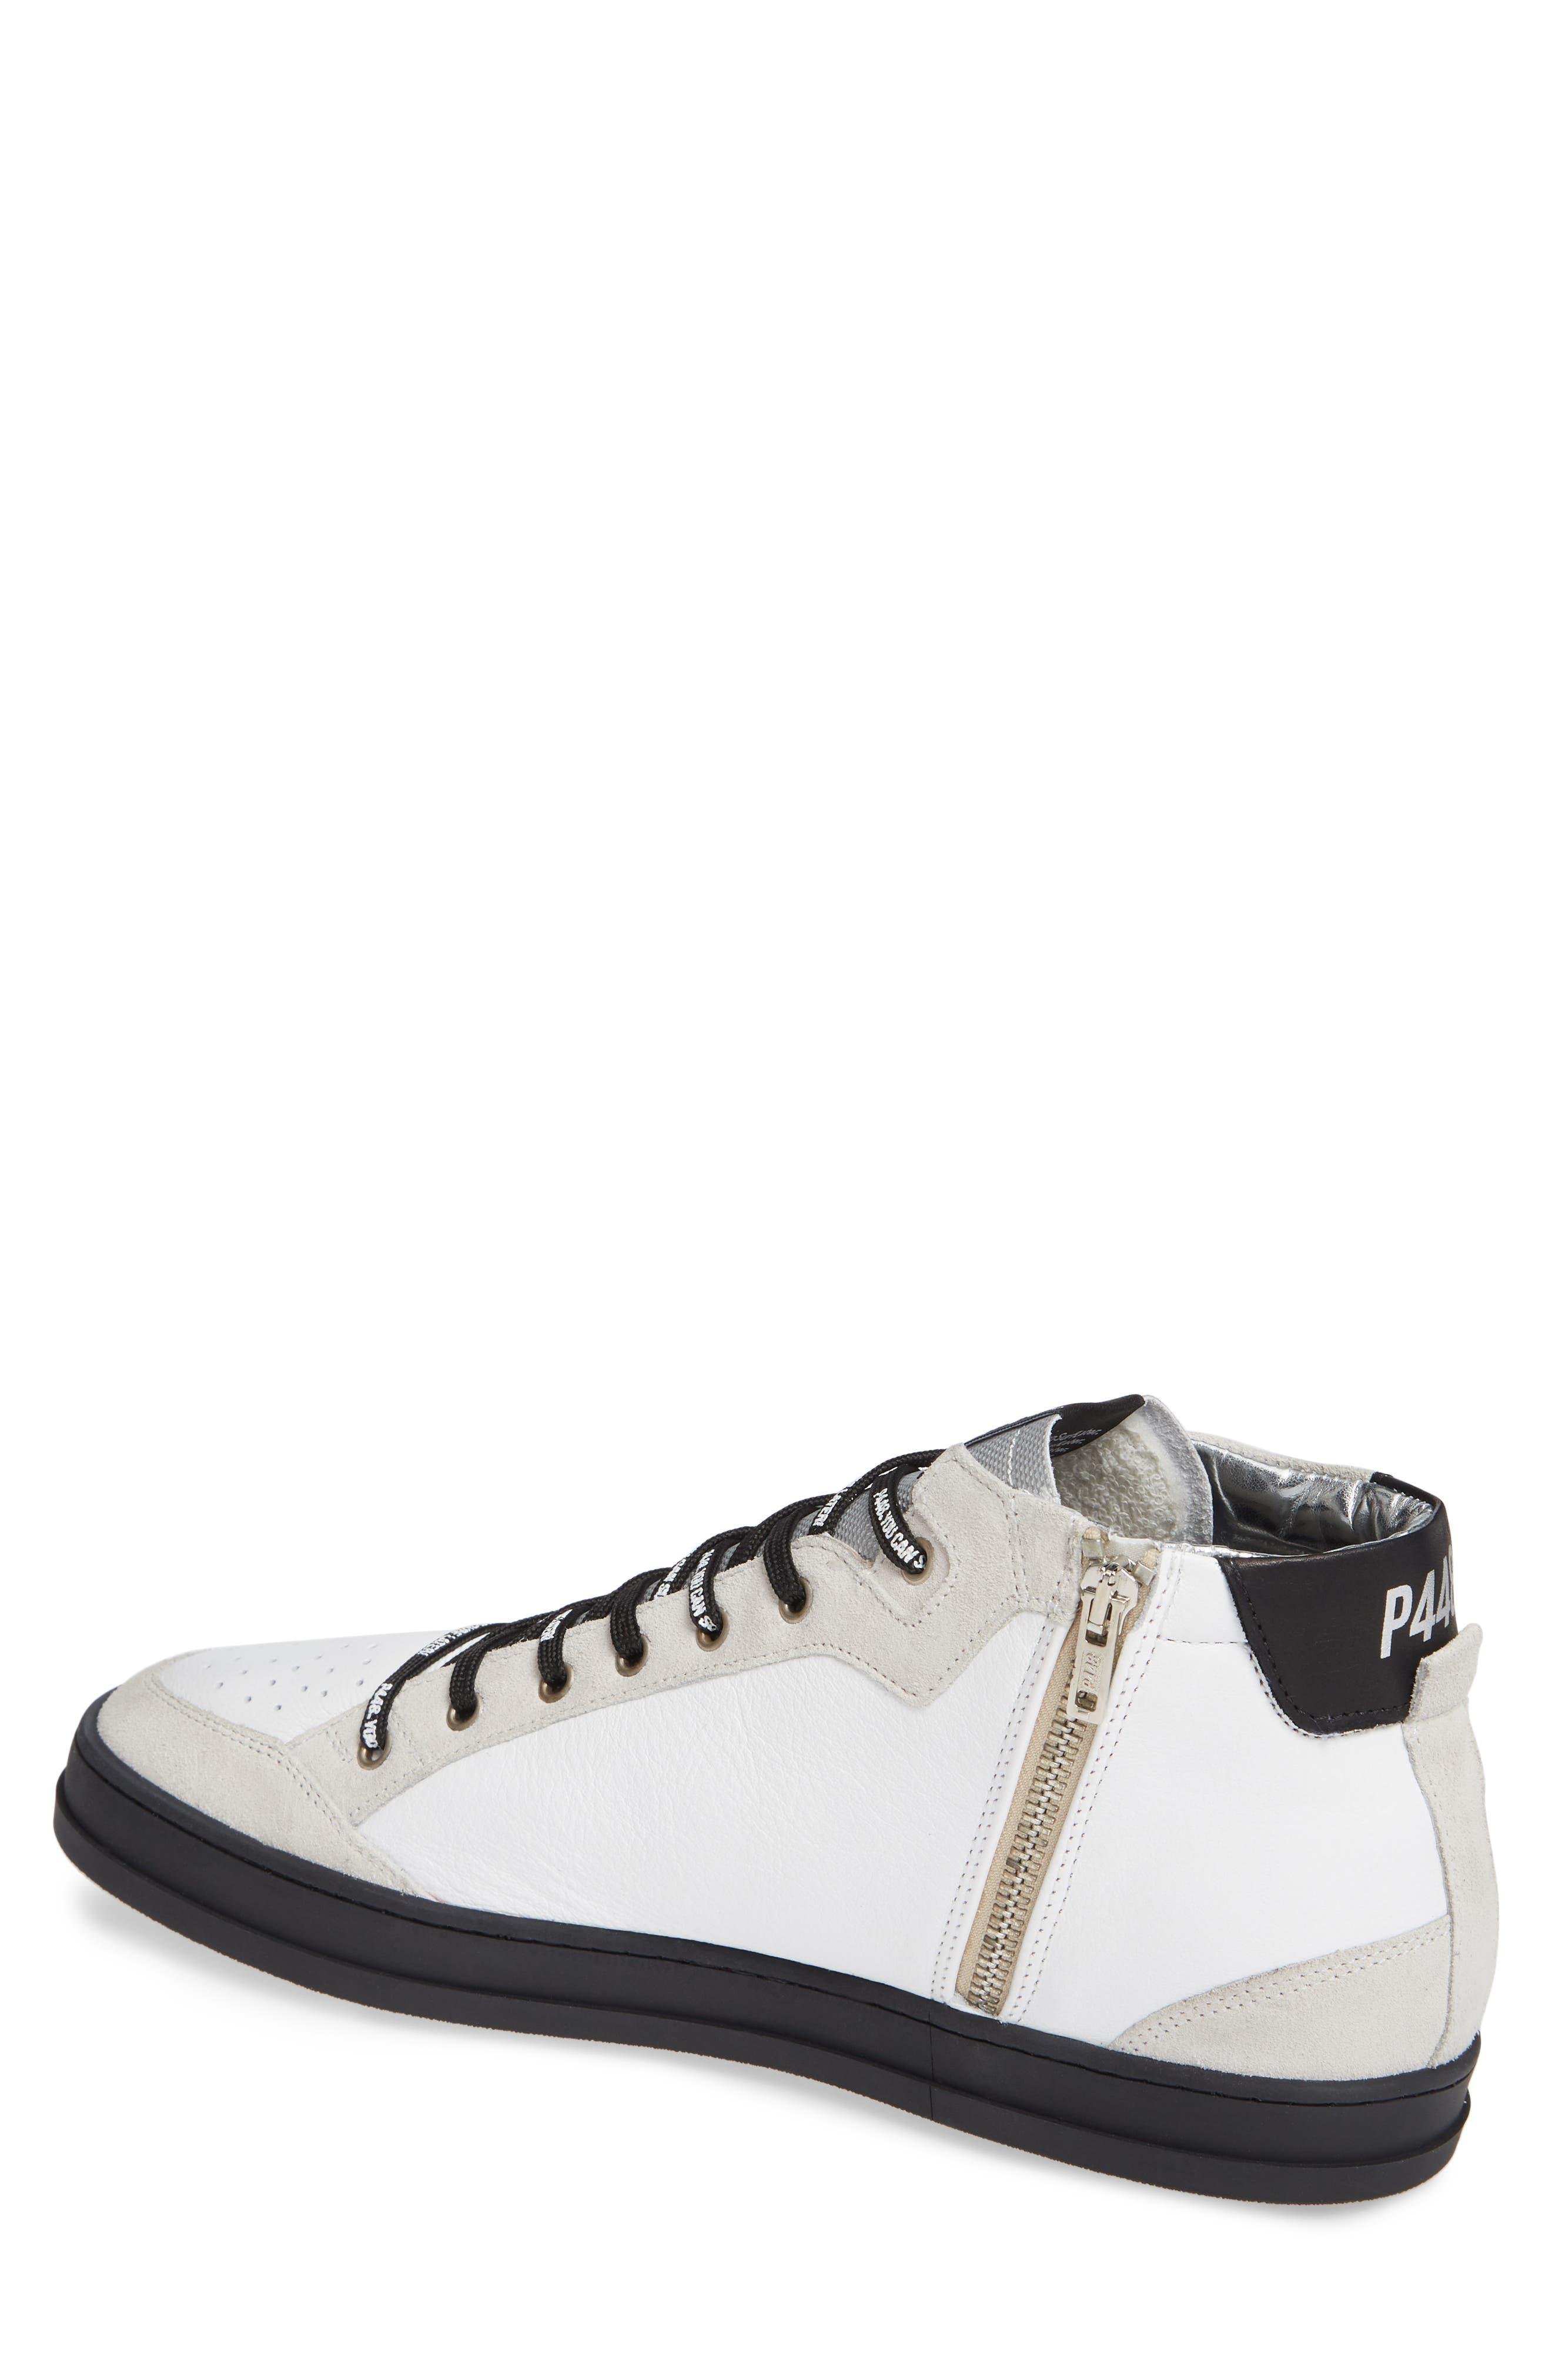 A8Love Mid Top Sneaker,                             Alternate thumbnail 2, color,                             WHITE/ BLACK